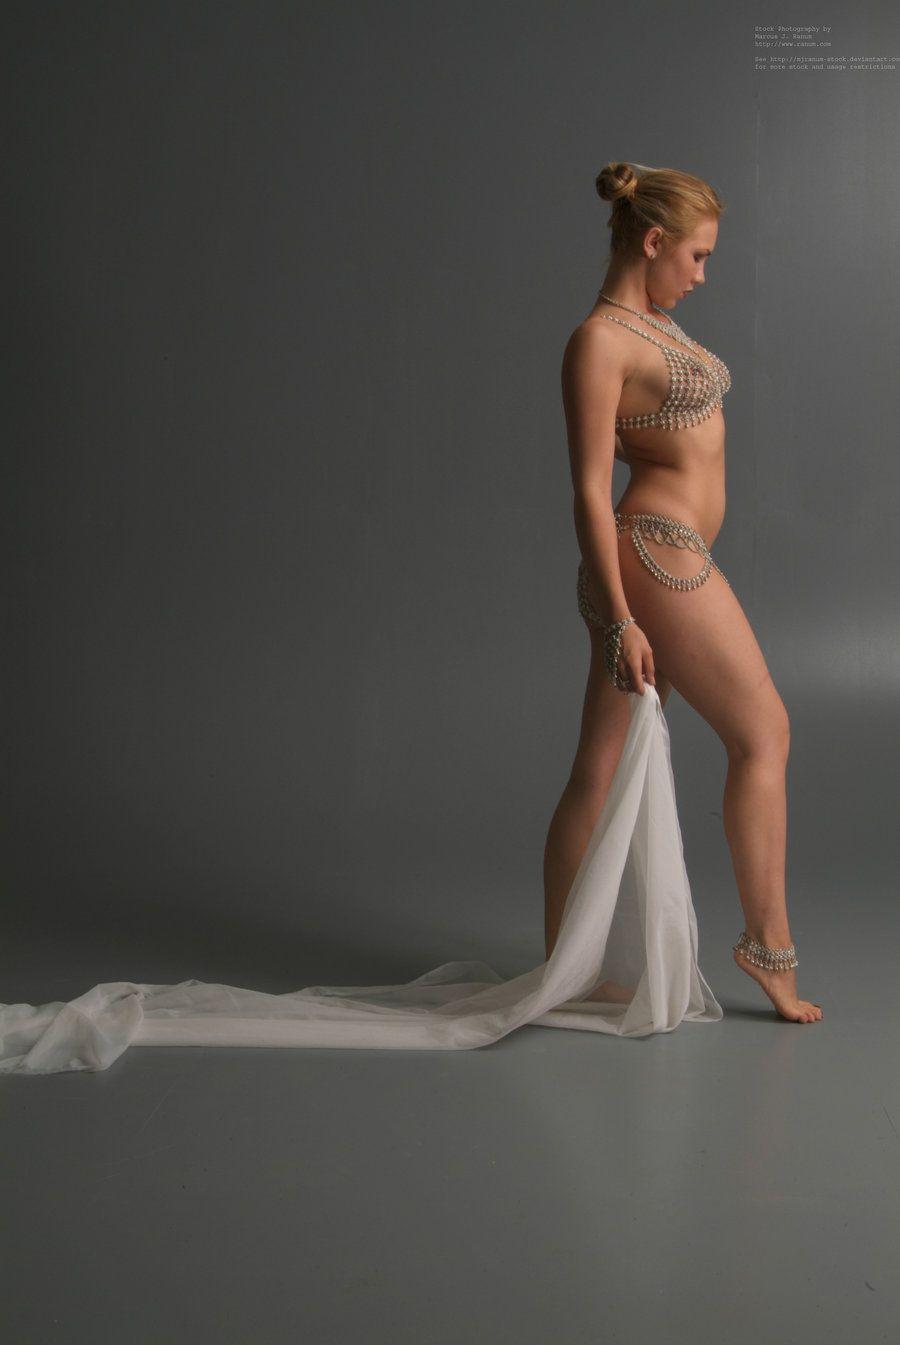 Female side profile nude